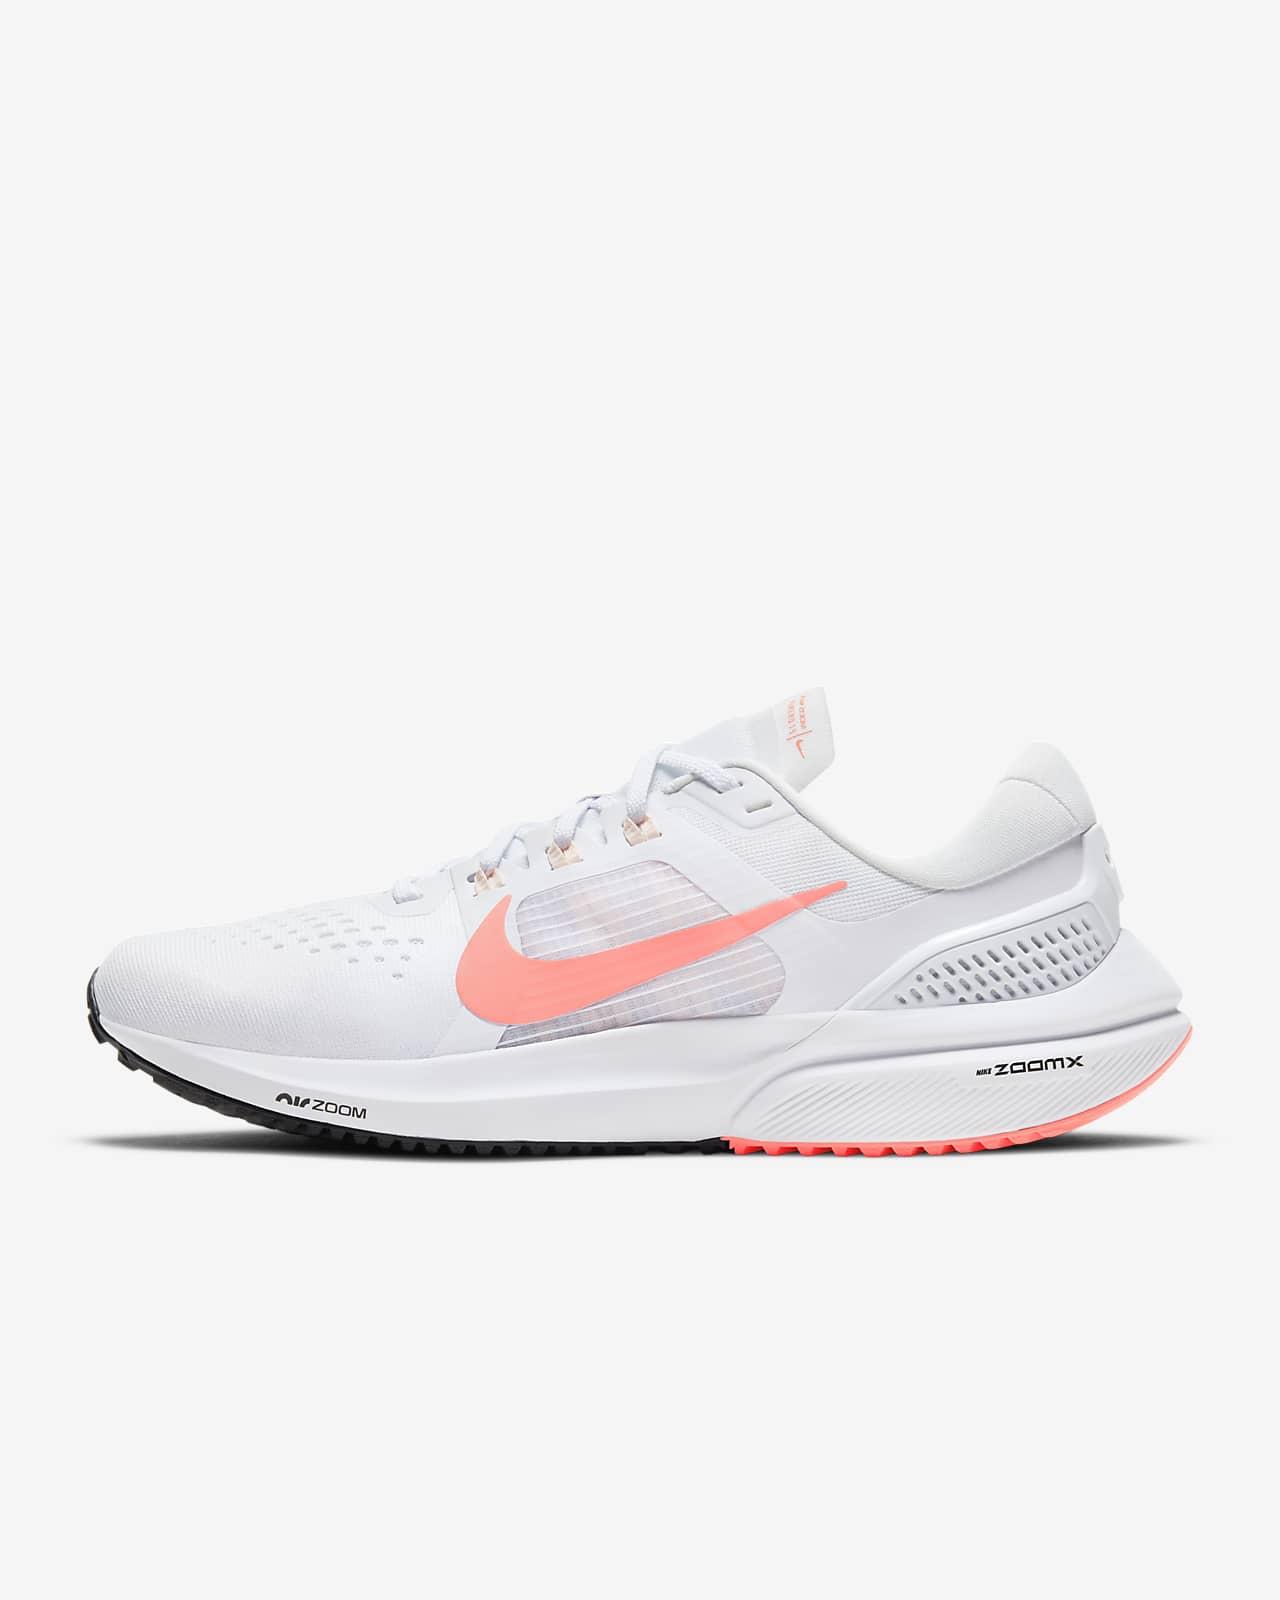 Sapatilhas de running Nike Air Zoom Vomero 15 para mulher